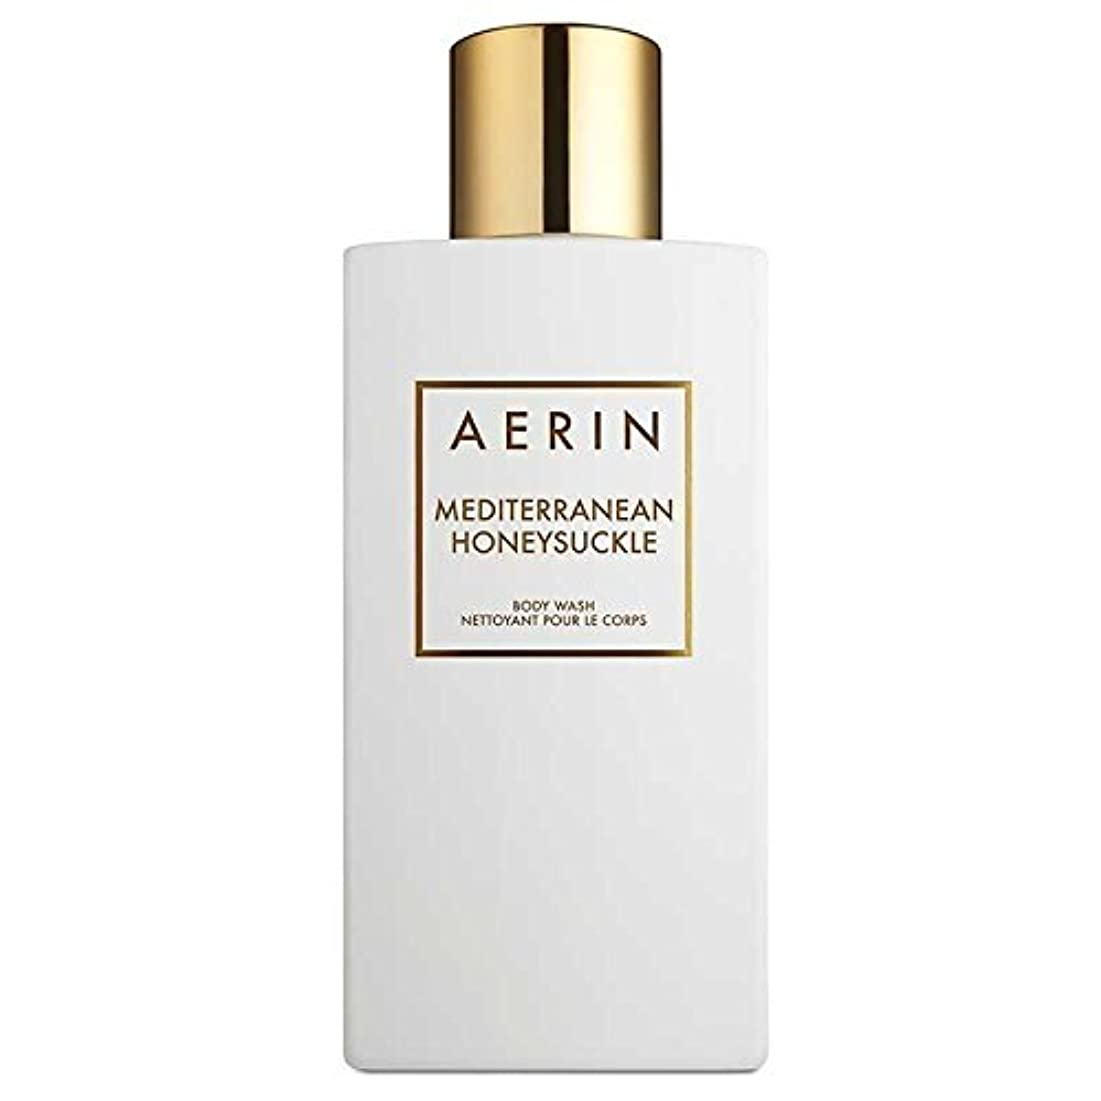 AERIN Mediterranean Honeysuckle (アエリン メディタレーニアン ハニーサックル) 7.6 oz (228ml) Body Wash ボディーウオッシュ by Estee Lauder for...